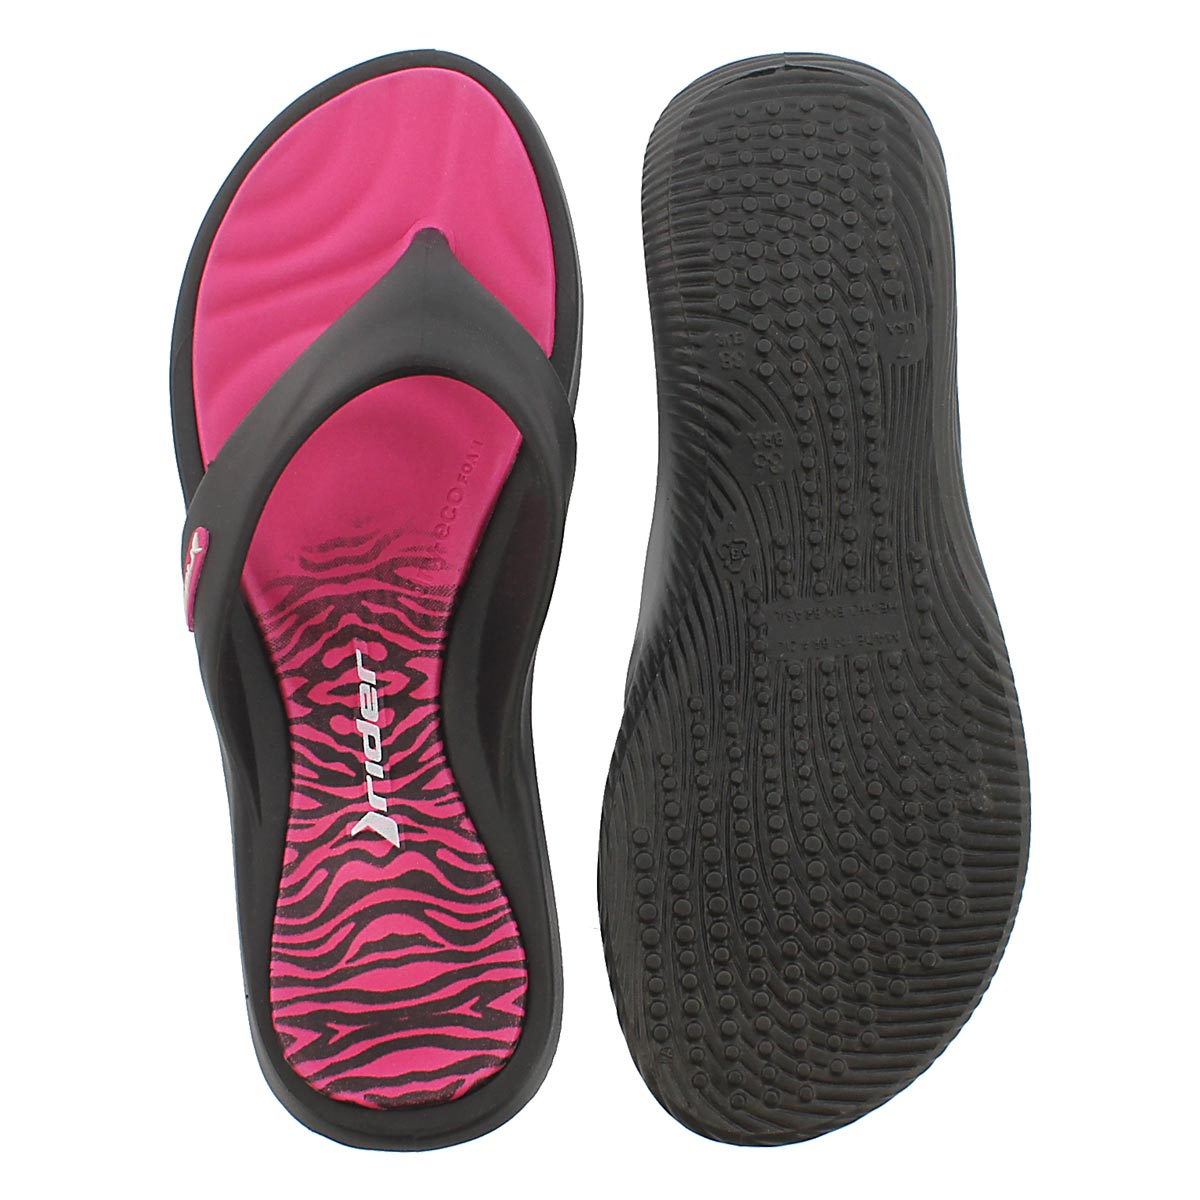 Lds Island VII pink thong sport sandal